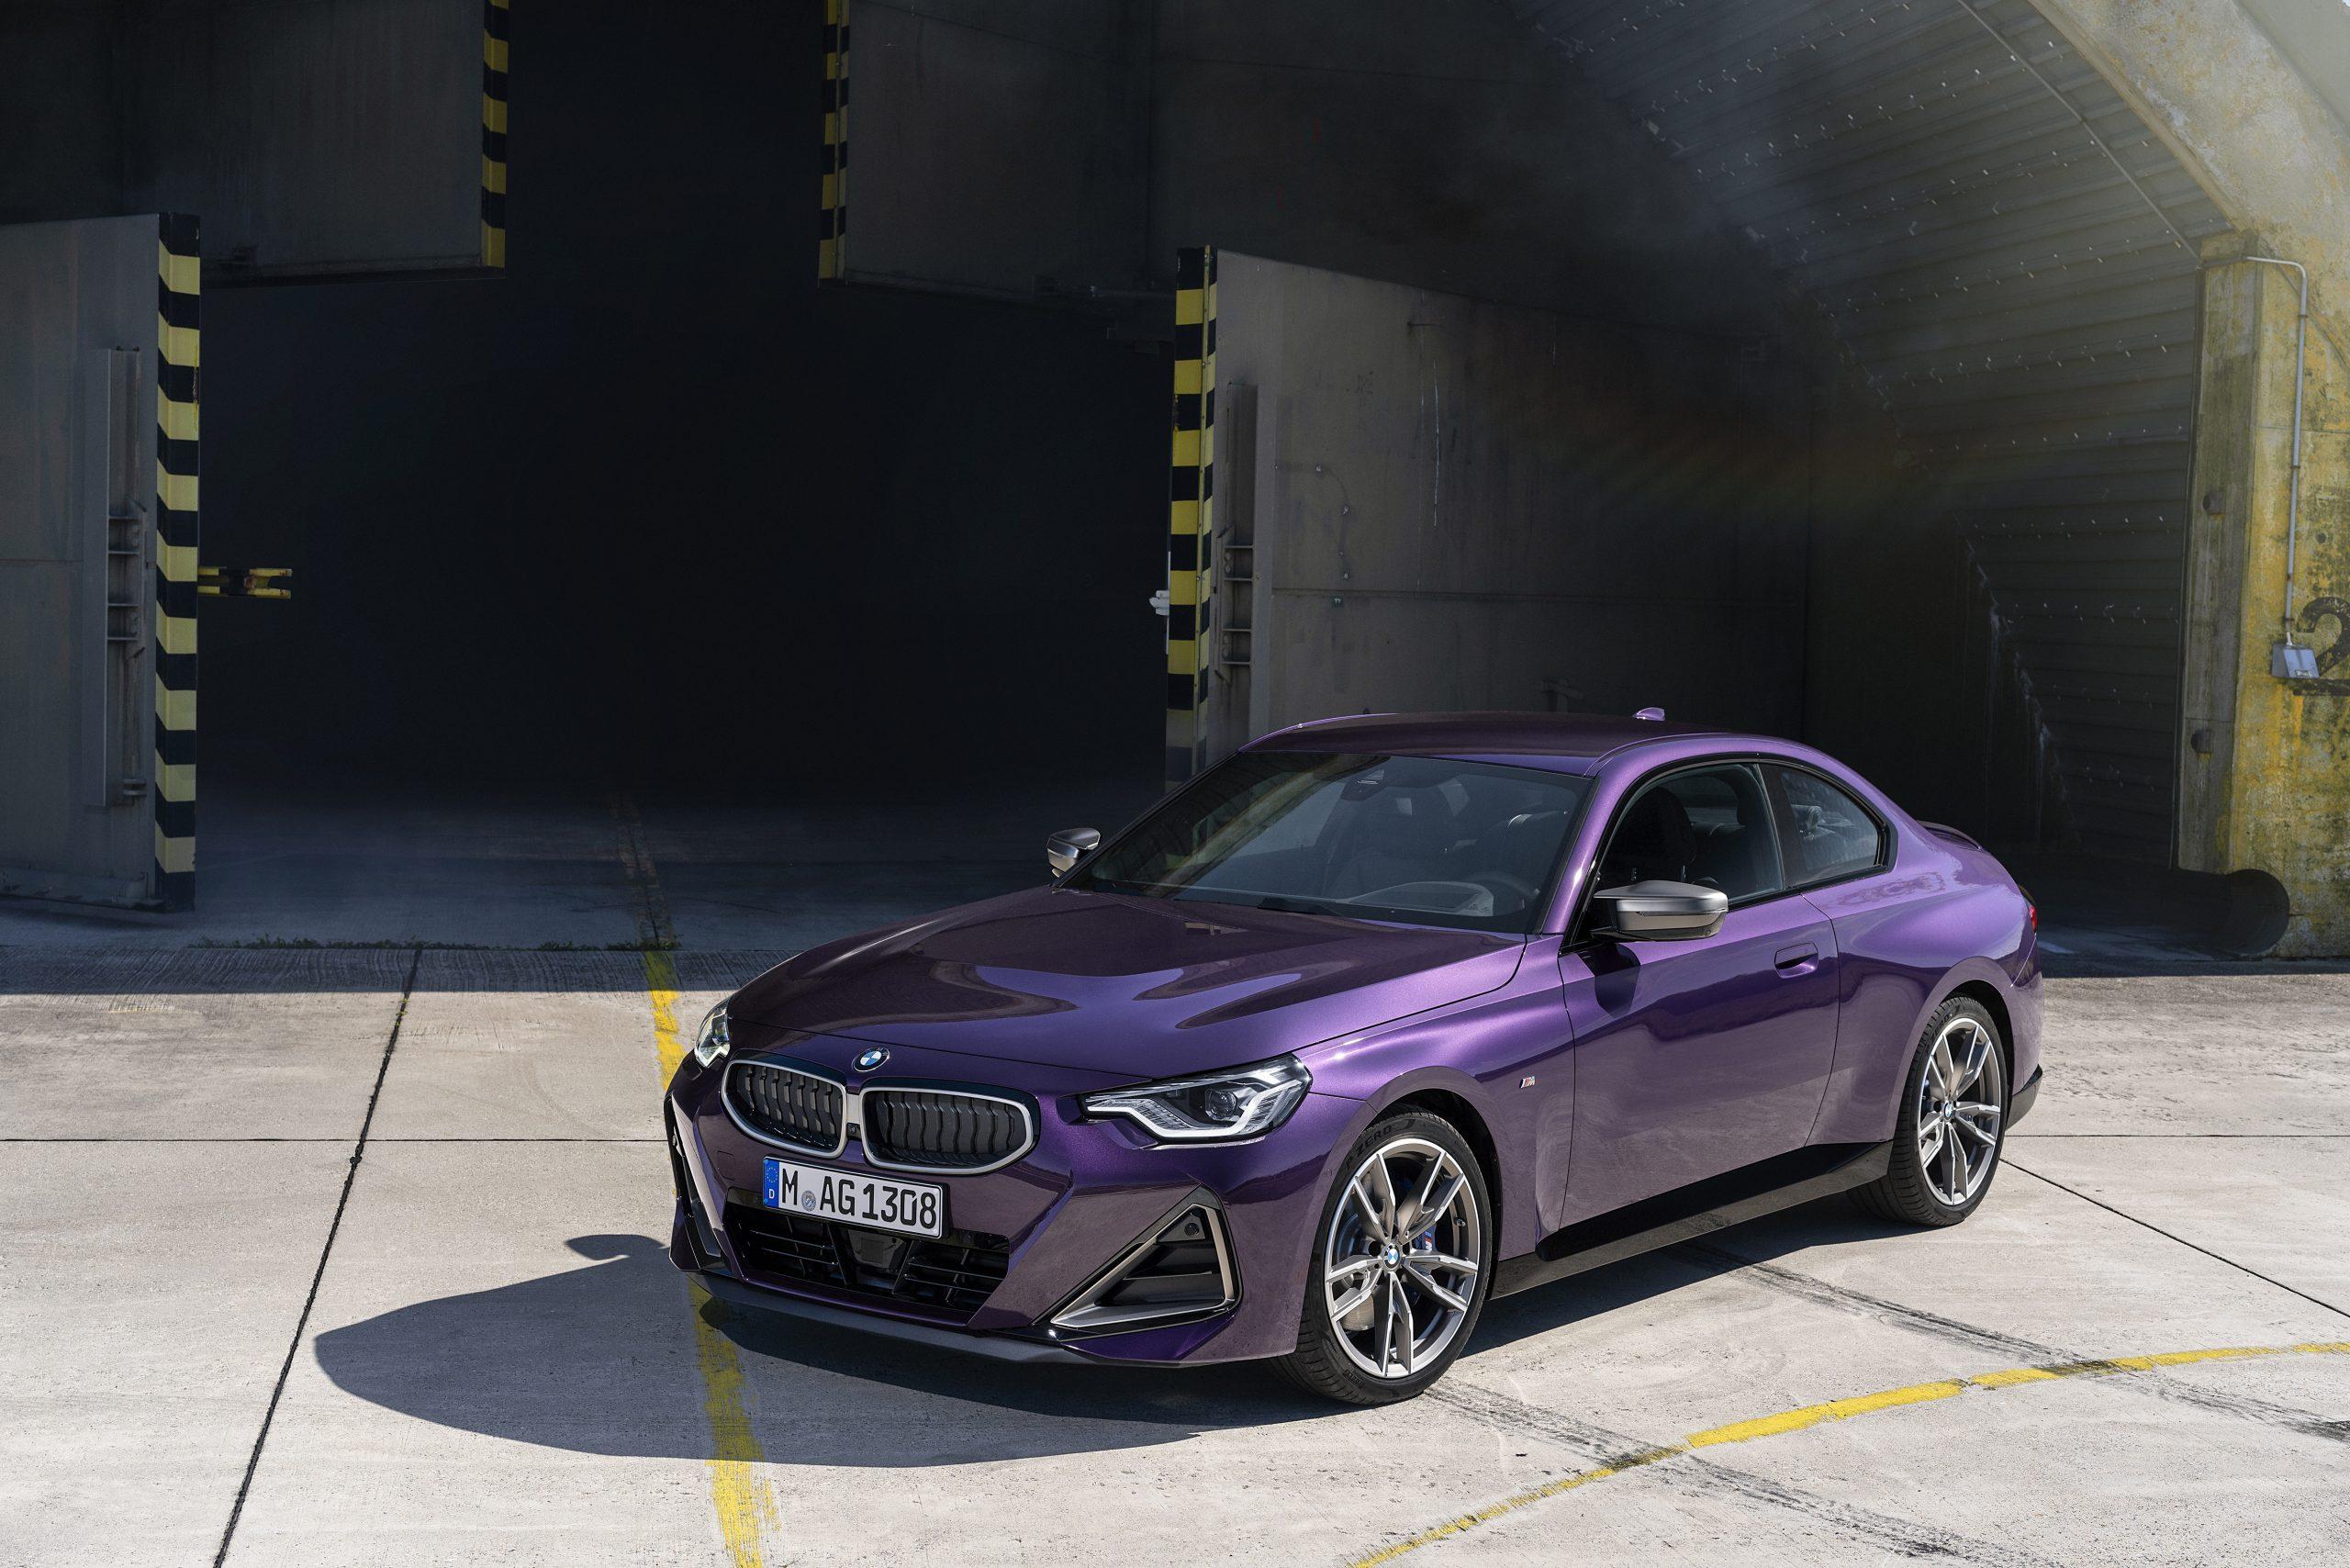 P90428476 highRes scaled Αυτή είναι η νέα BMW Σειρά 2 Coupe BMW, Bmw 2, BMW Σειρά 2, zblog, ειδήσεις, Νέα, Σειρά 2